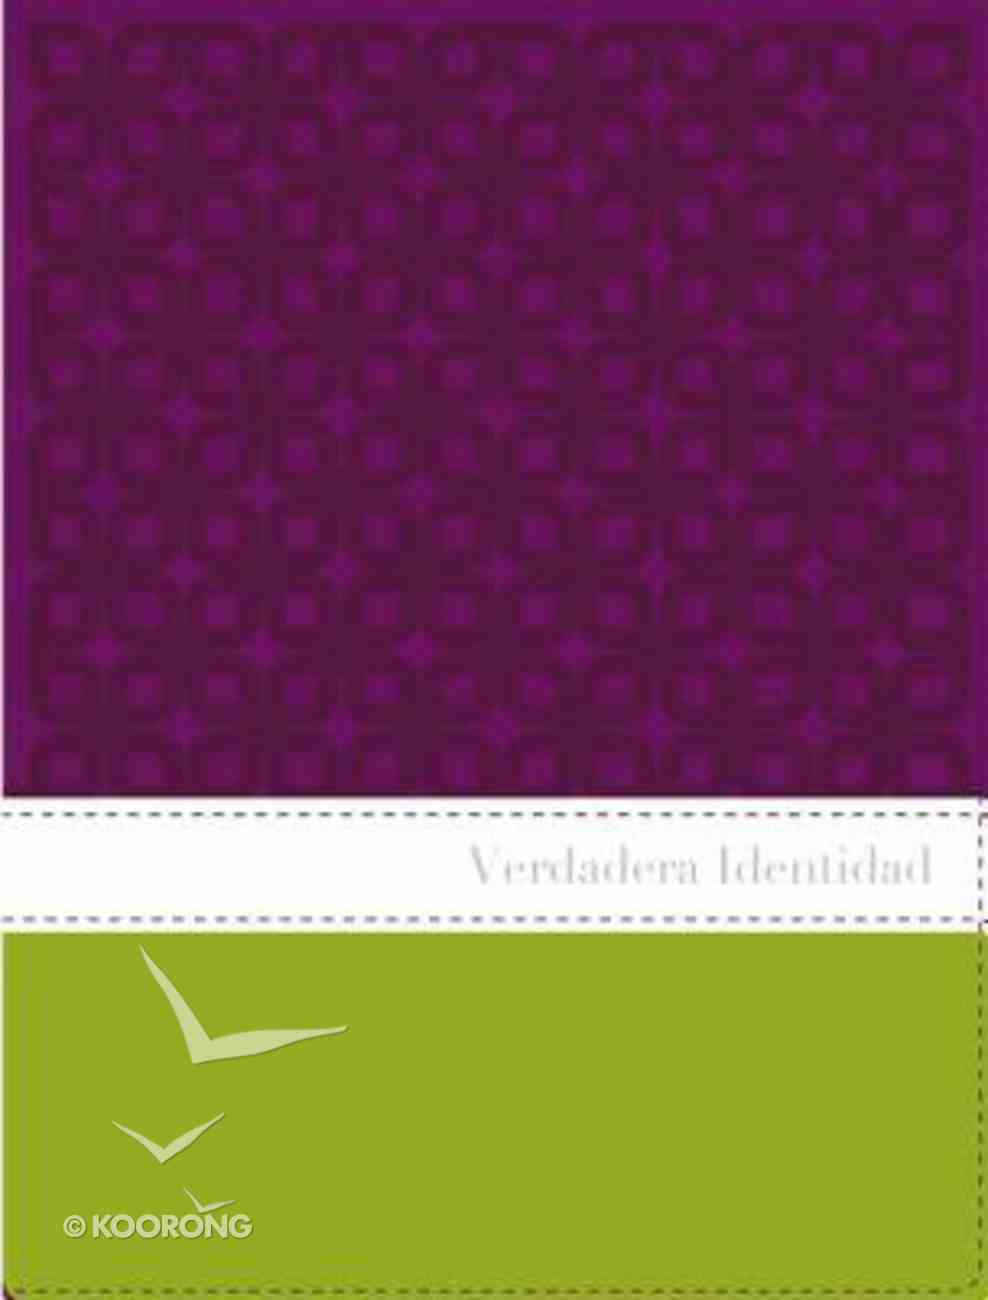 Nvi Verdadera Identidad Italian Duo-Tone Purple/Green / True Identity Bible For Women the Imitation Leather